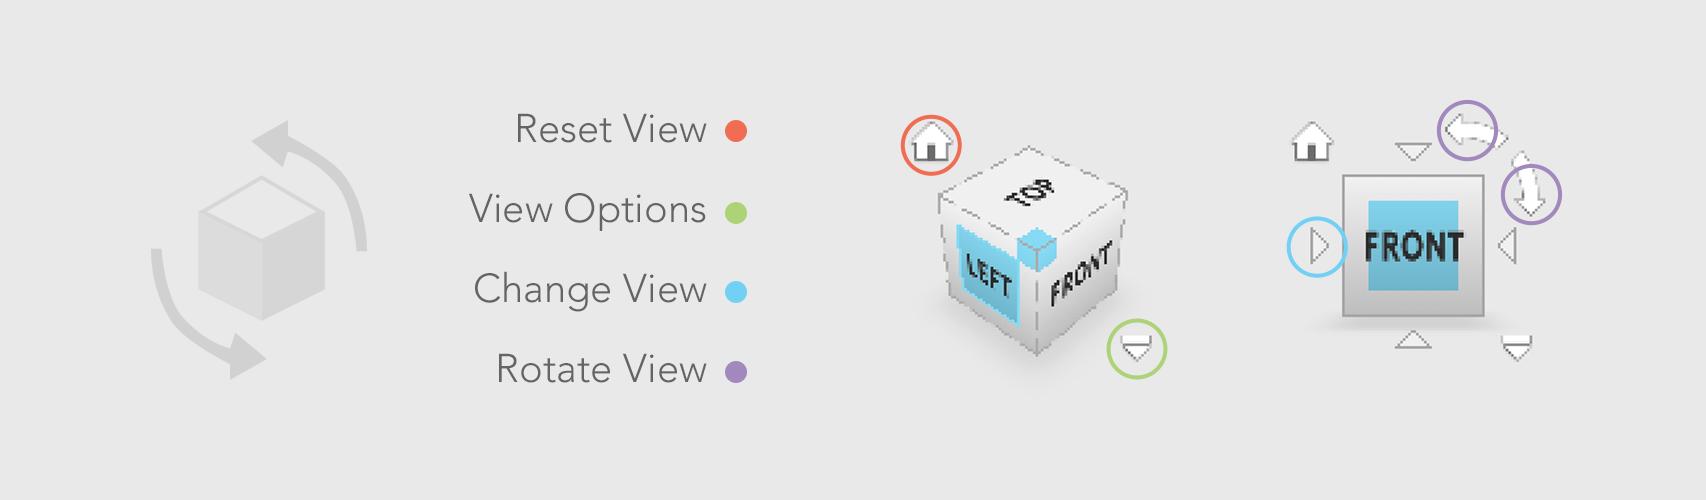 123D Design - Navigation Cube